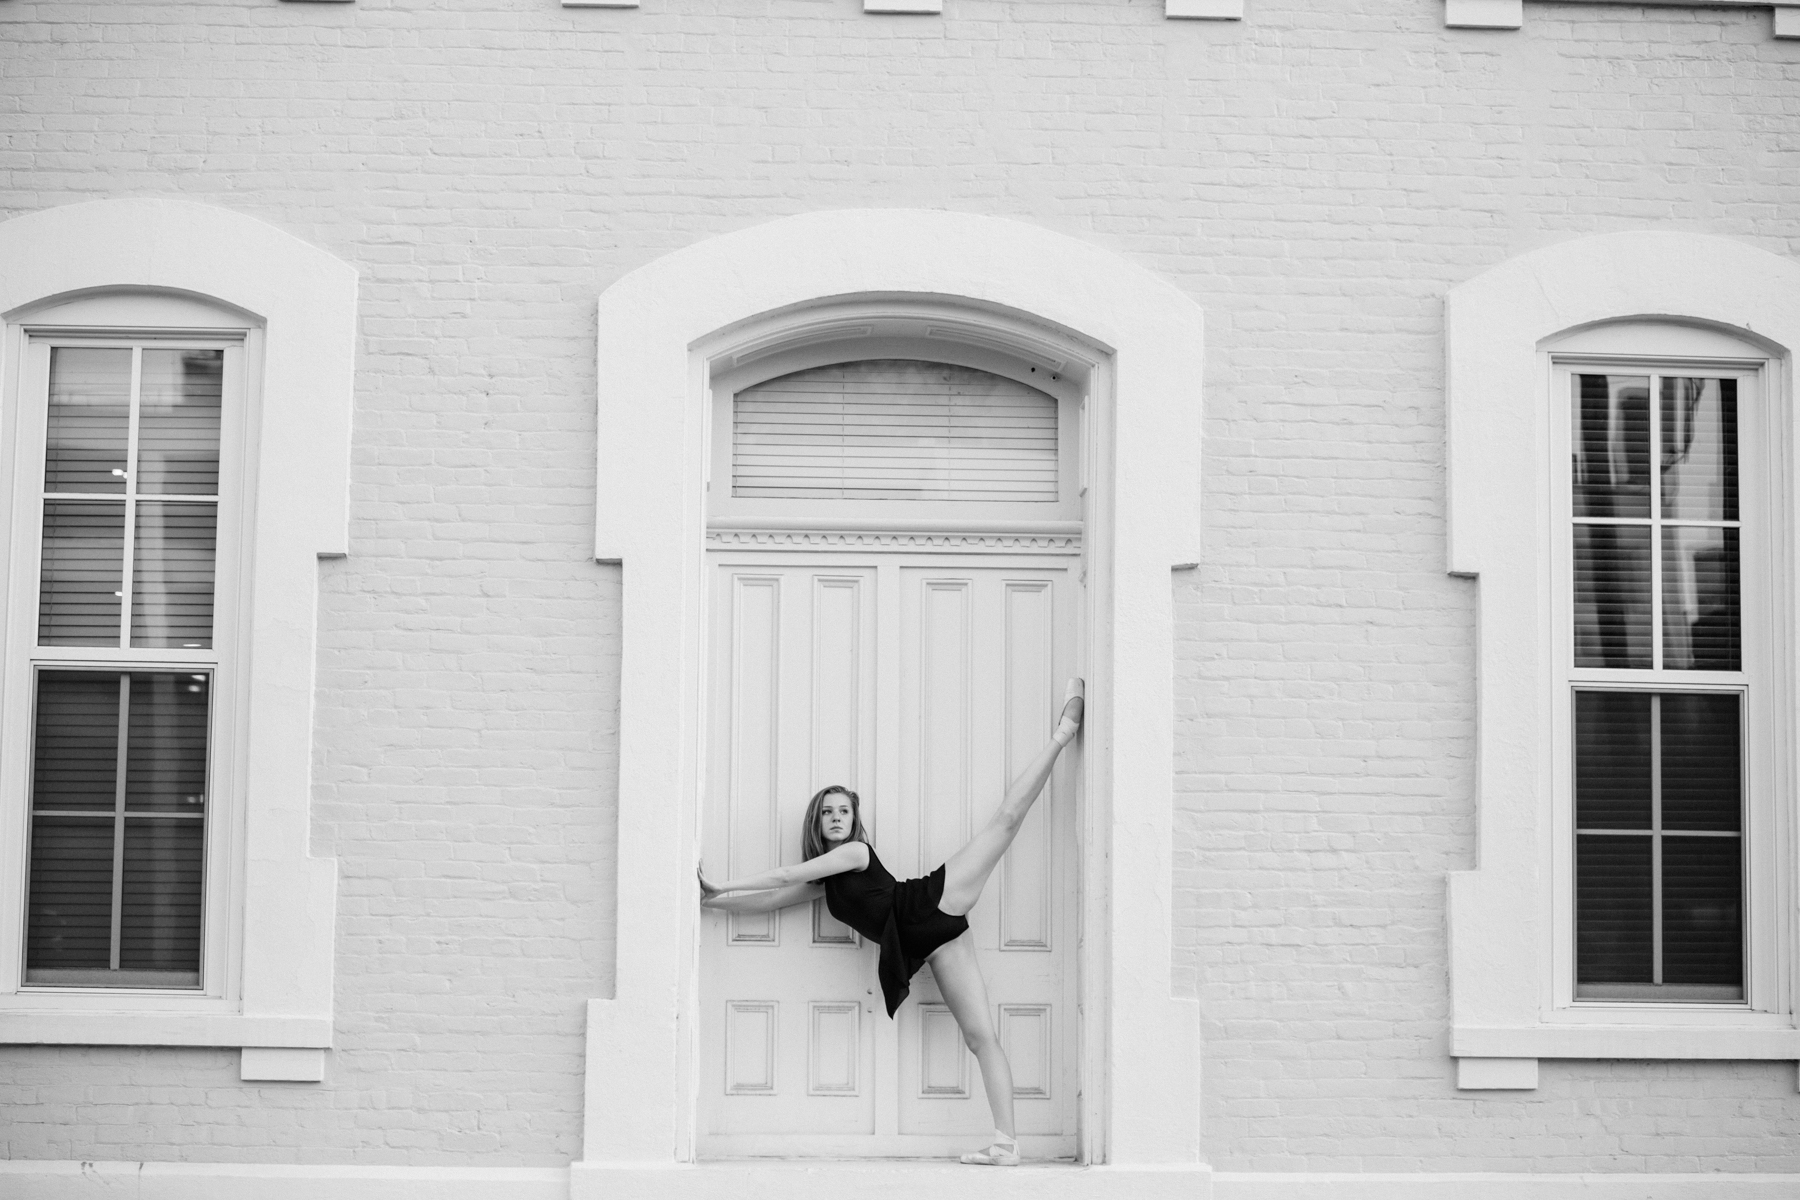 2018_06_18_grace_dance_downtown_durham-2185.jpg